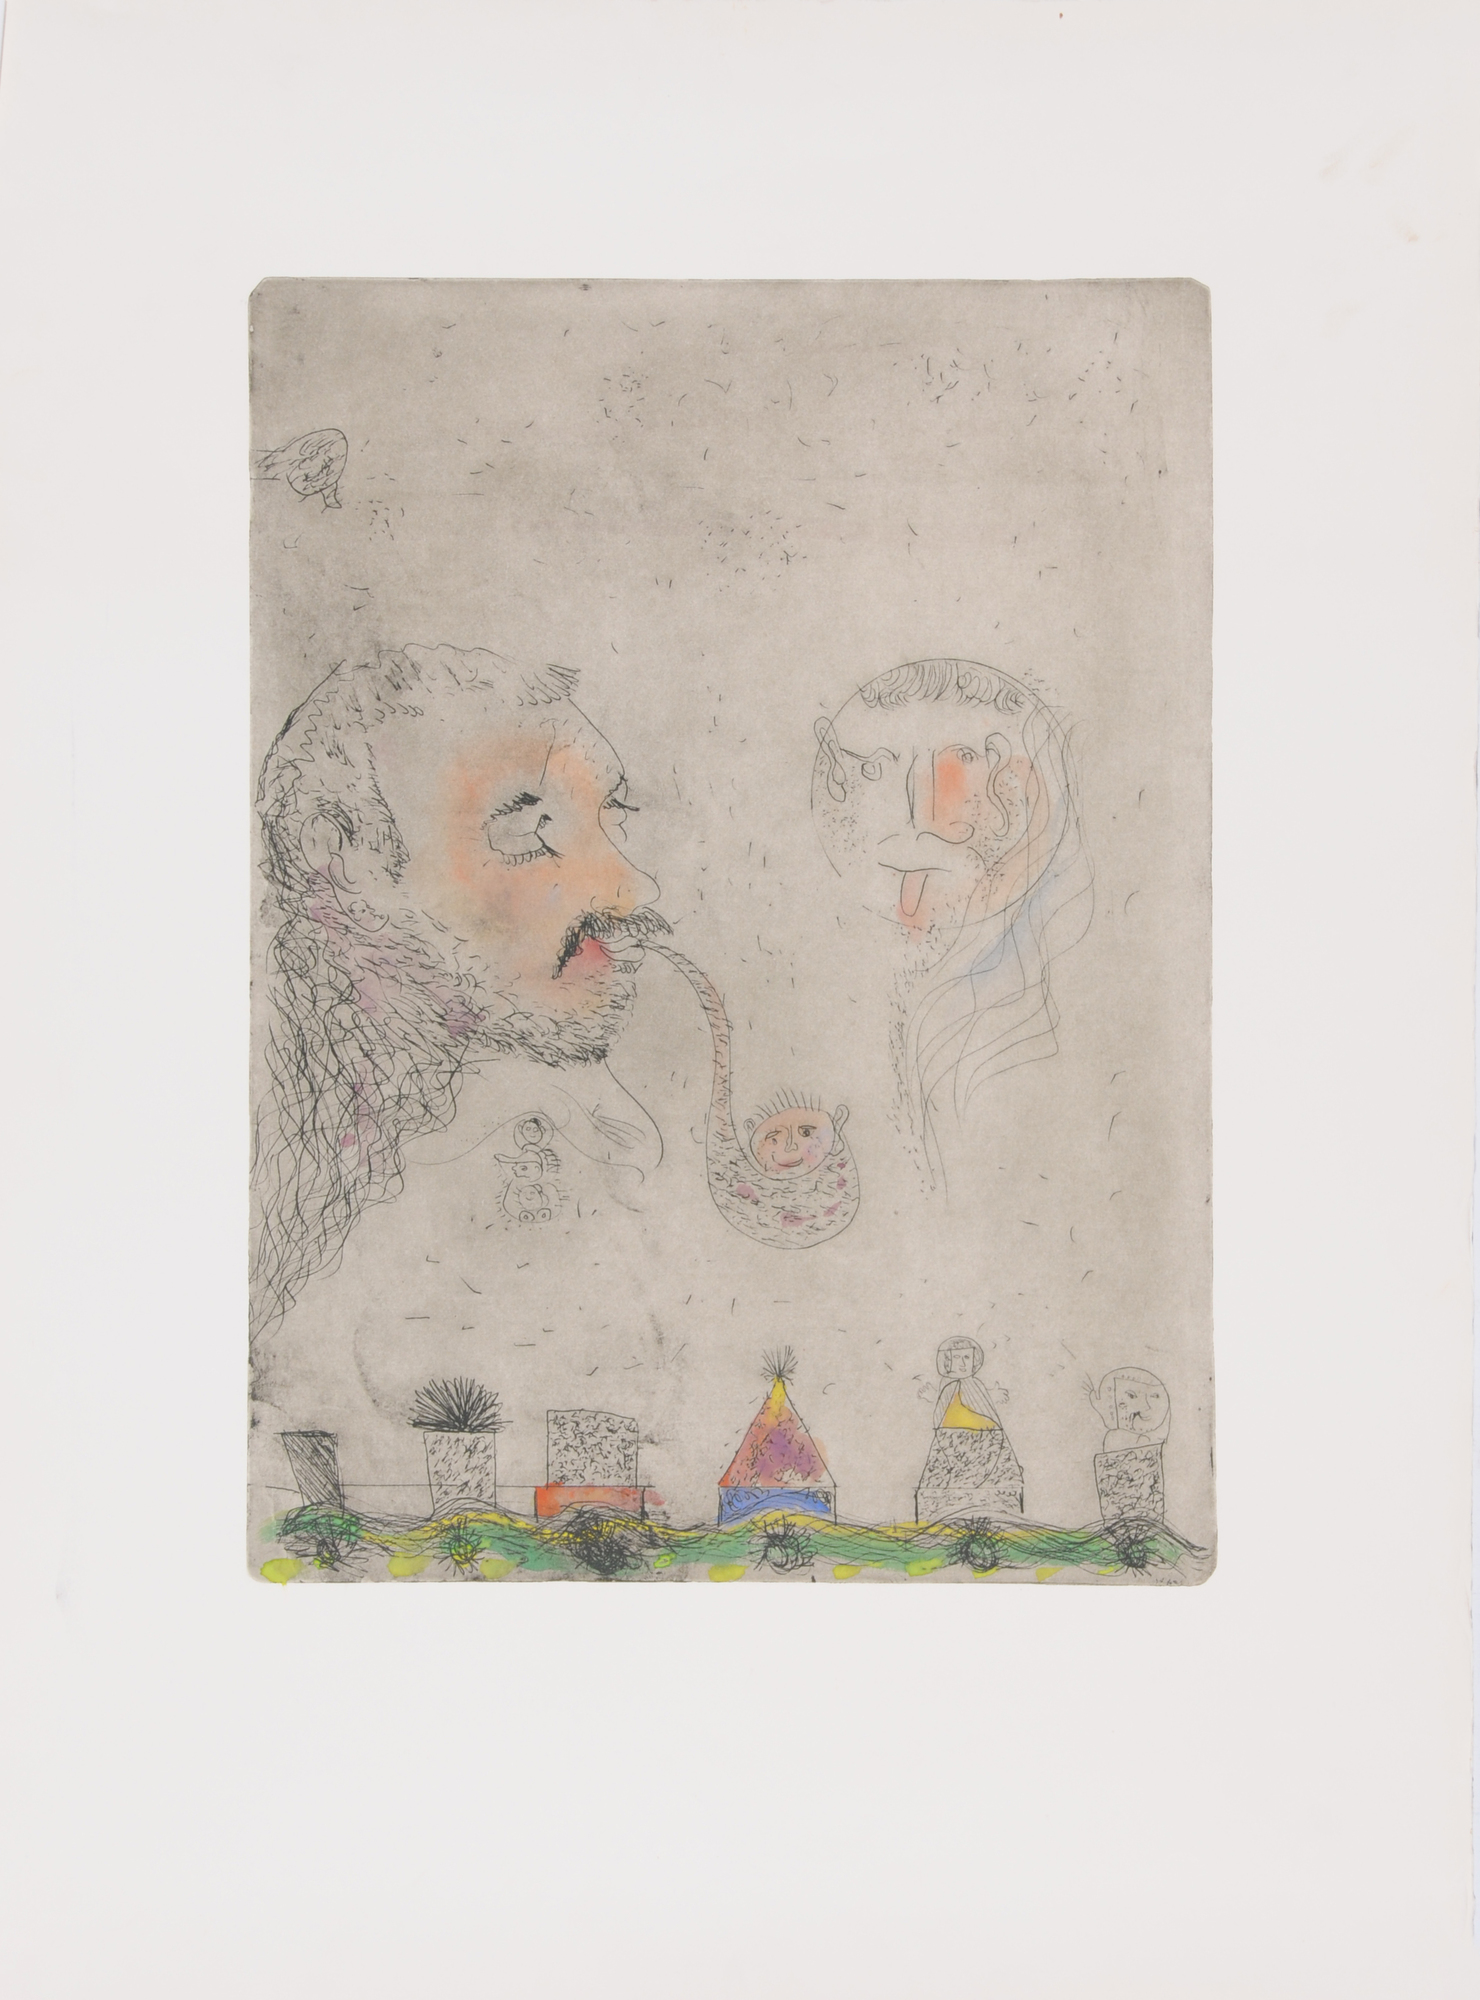 Kuhn Friedrich, 2 sheets: Untitled